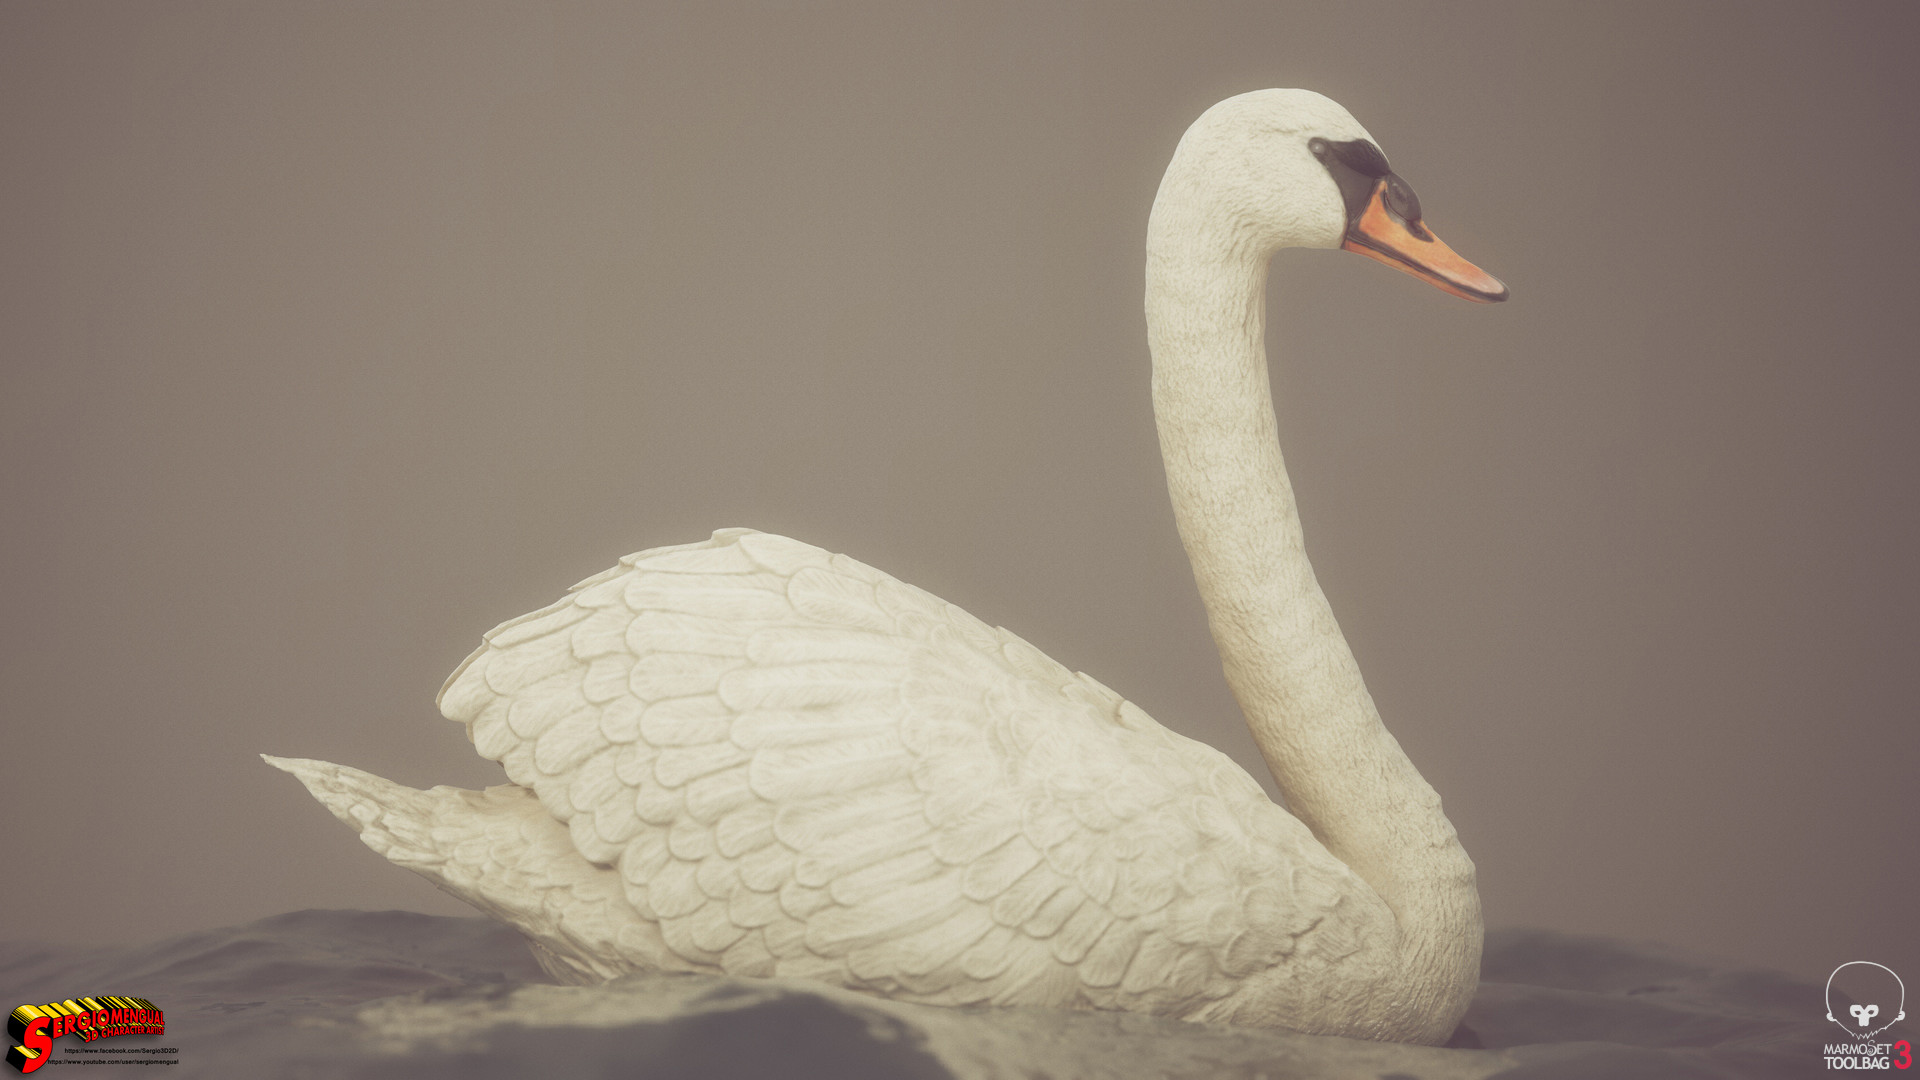 Sergio gabriel mengual swan horizontal 1